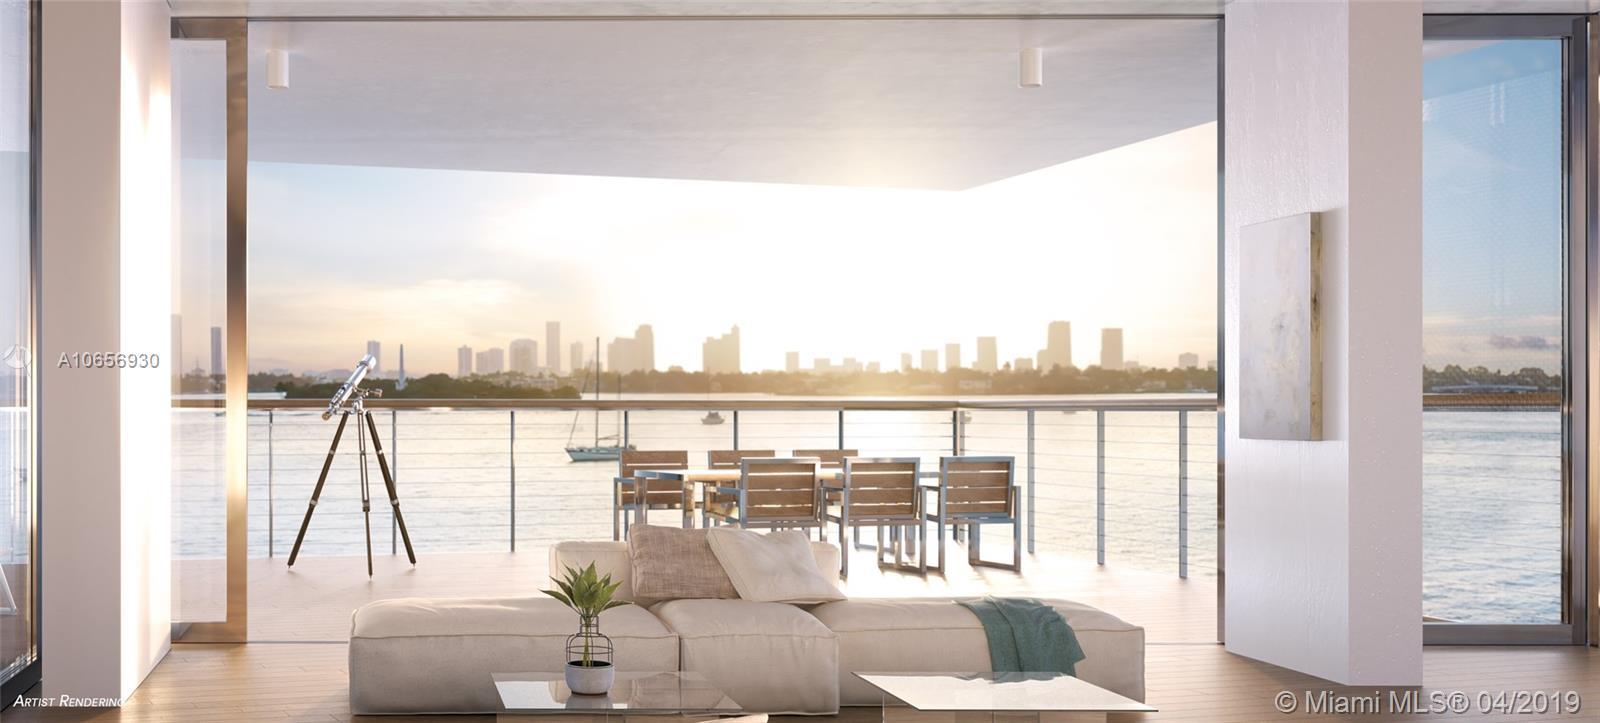 1300  Monad Terrace #3A For Sale A10656930, FL